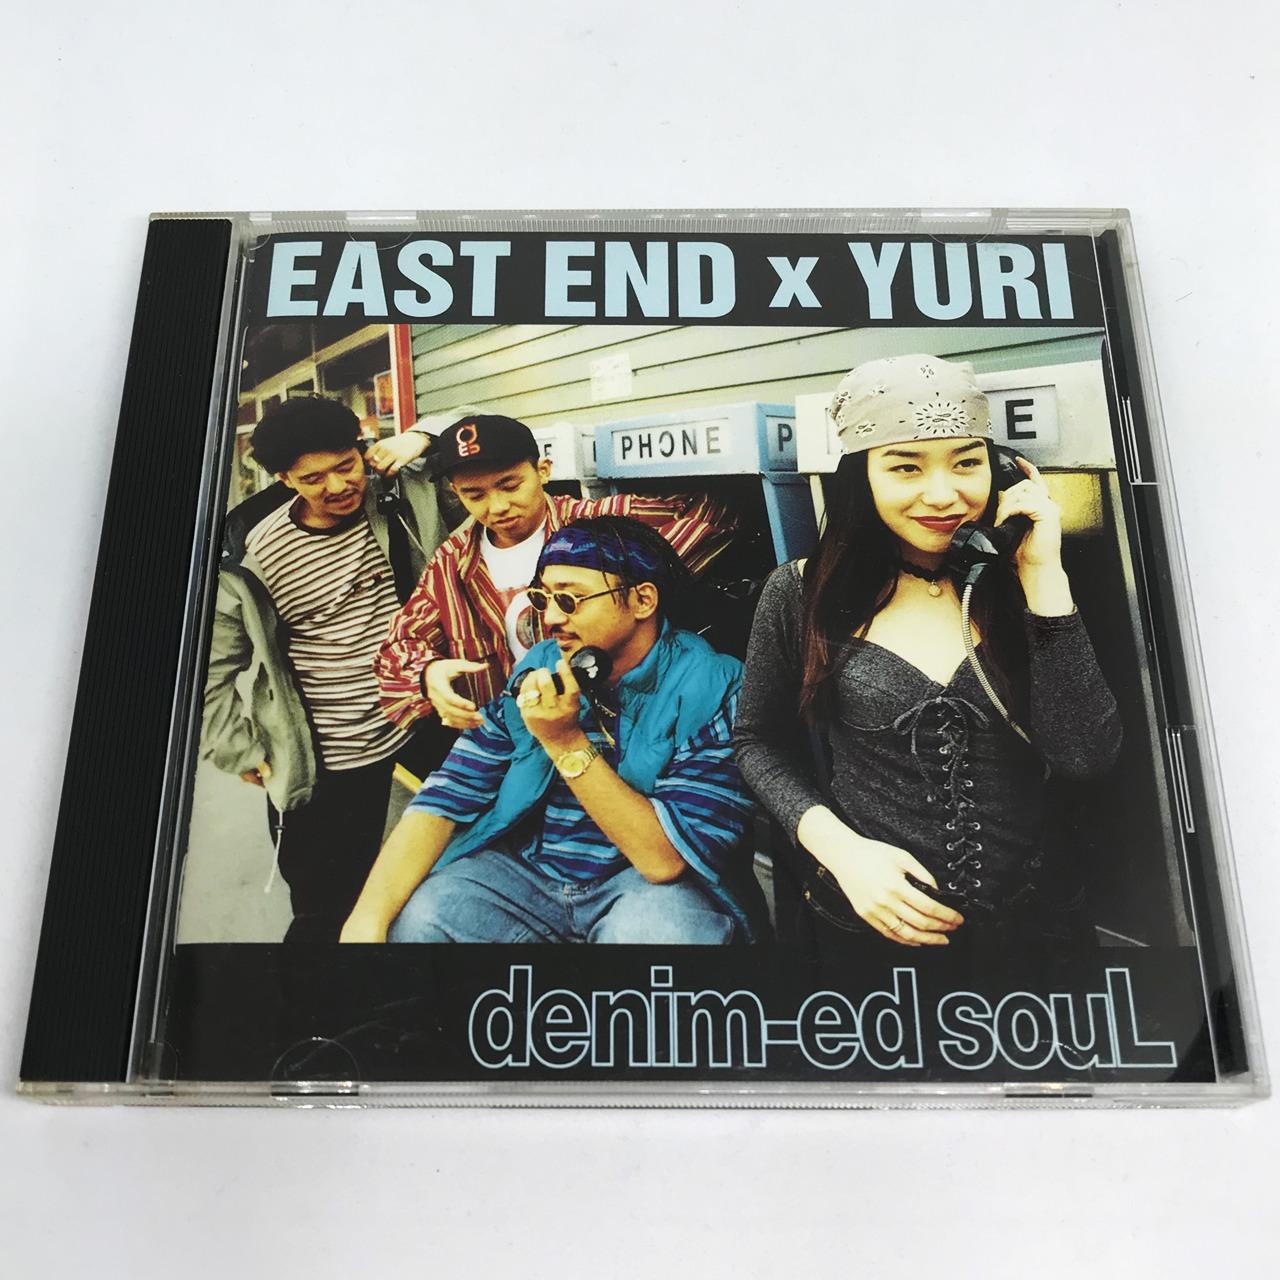 EAST END x YURI / DENIM-ED SOUL